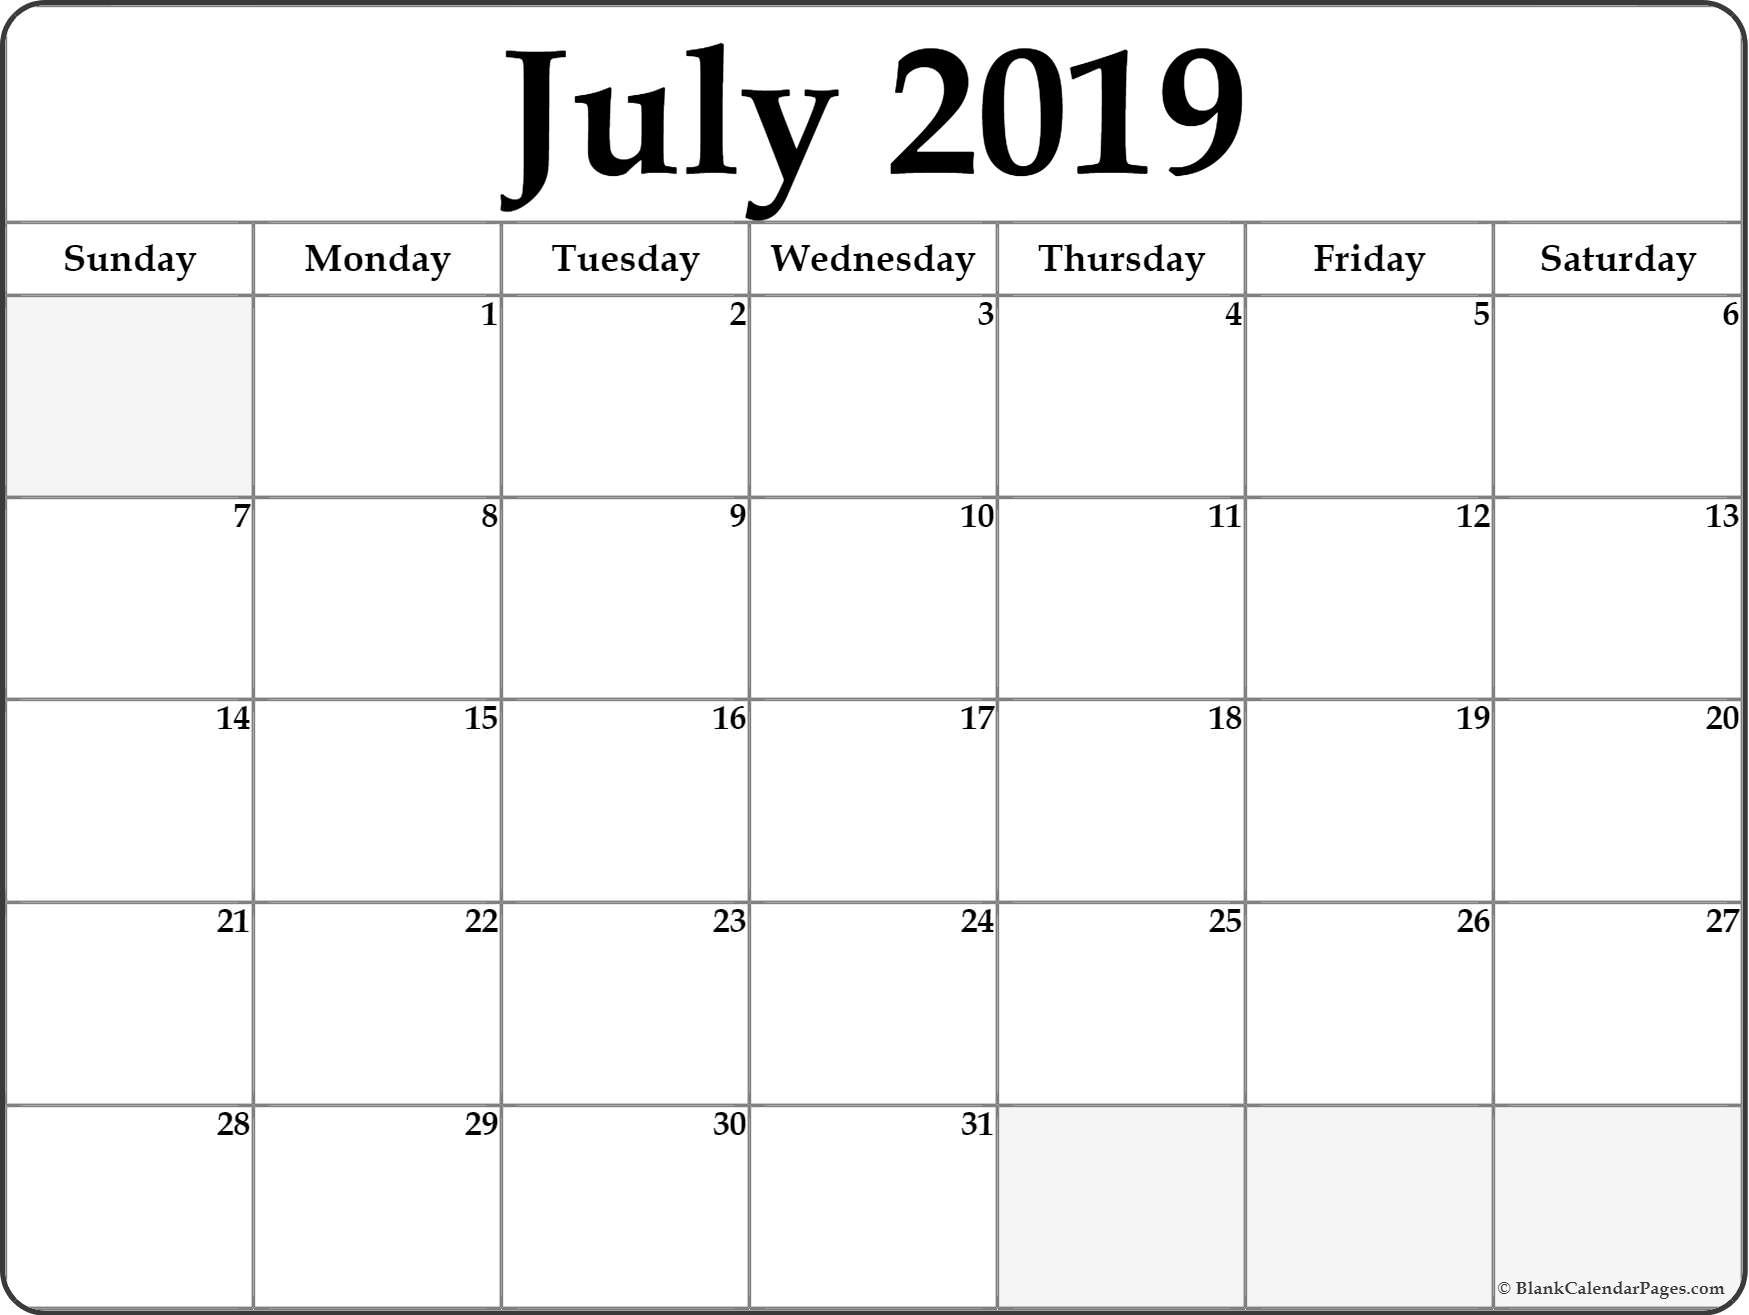 July 2019 Blank Calendar Collection. July 2 2019 Calendar